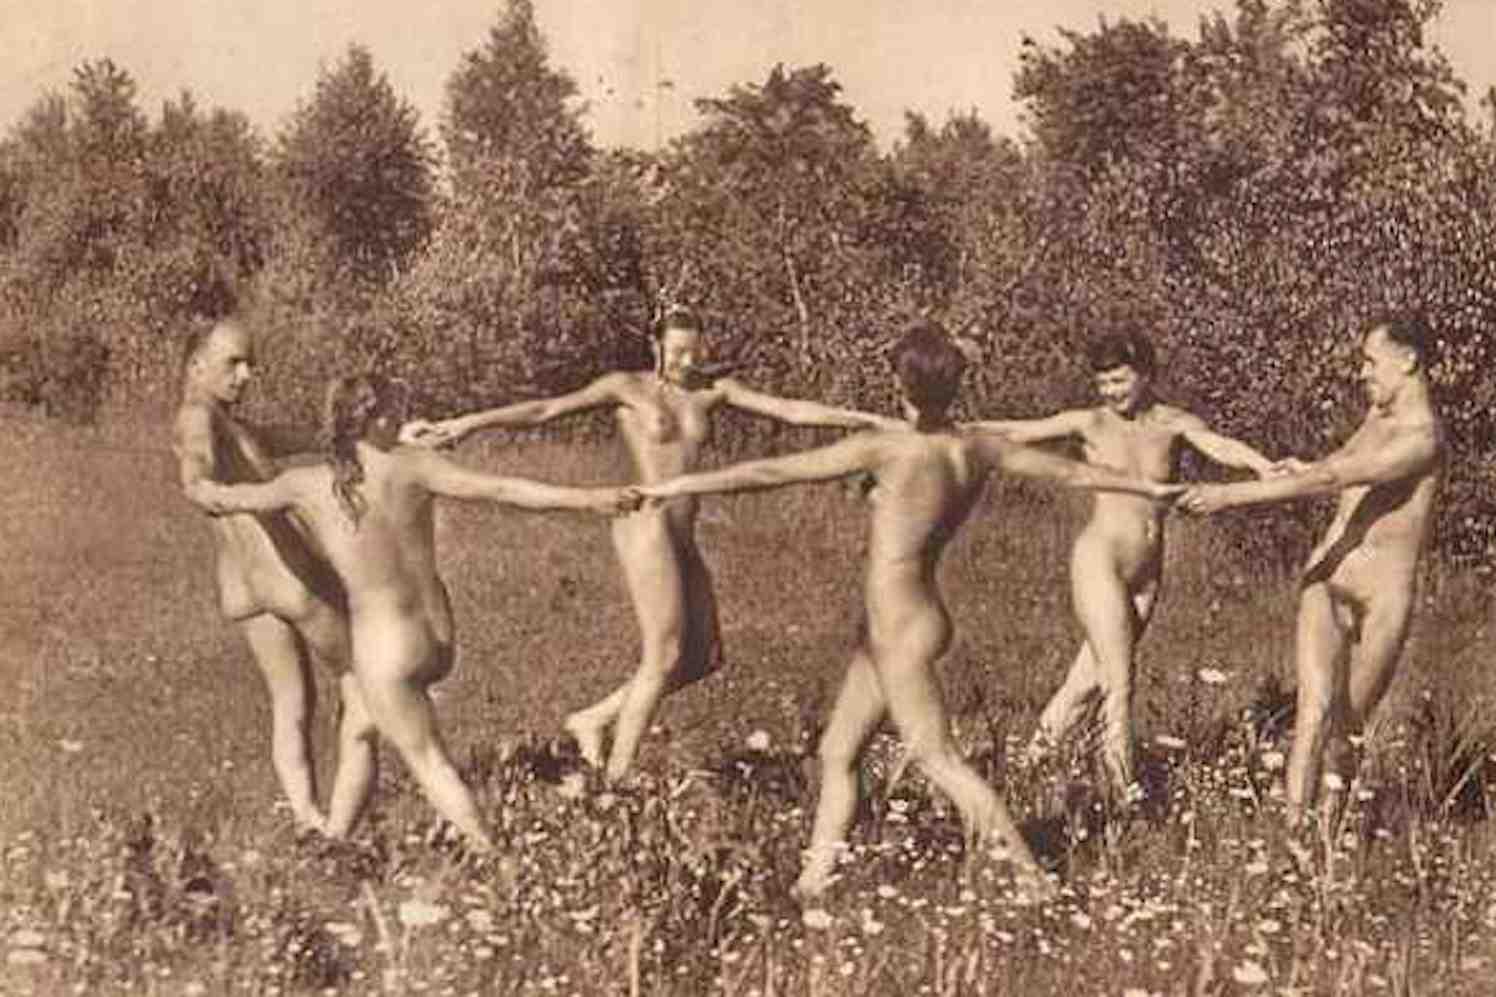 srilankan nude hot girls